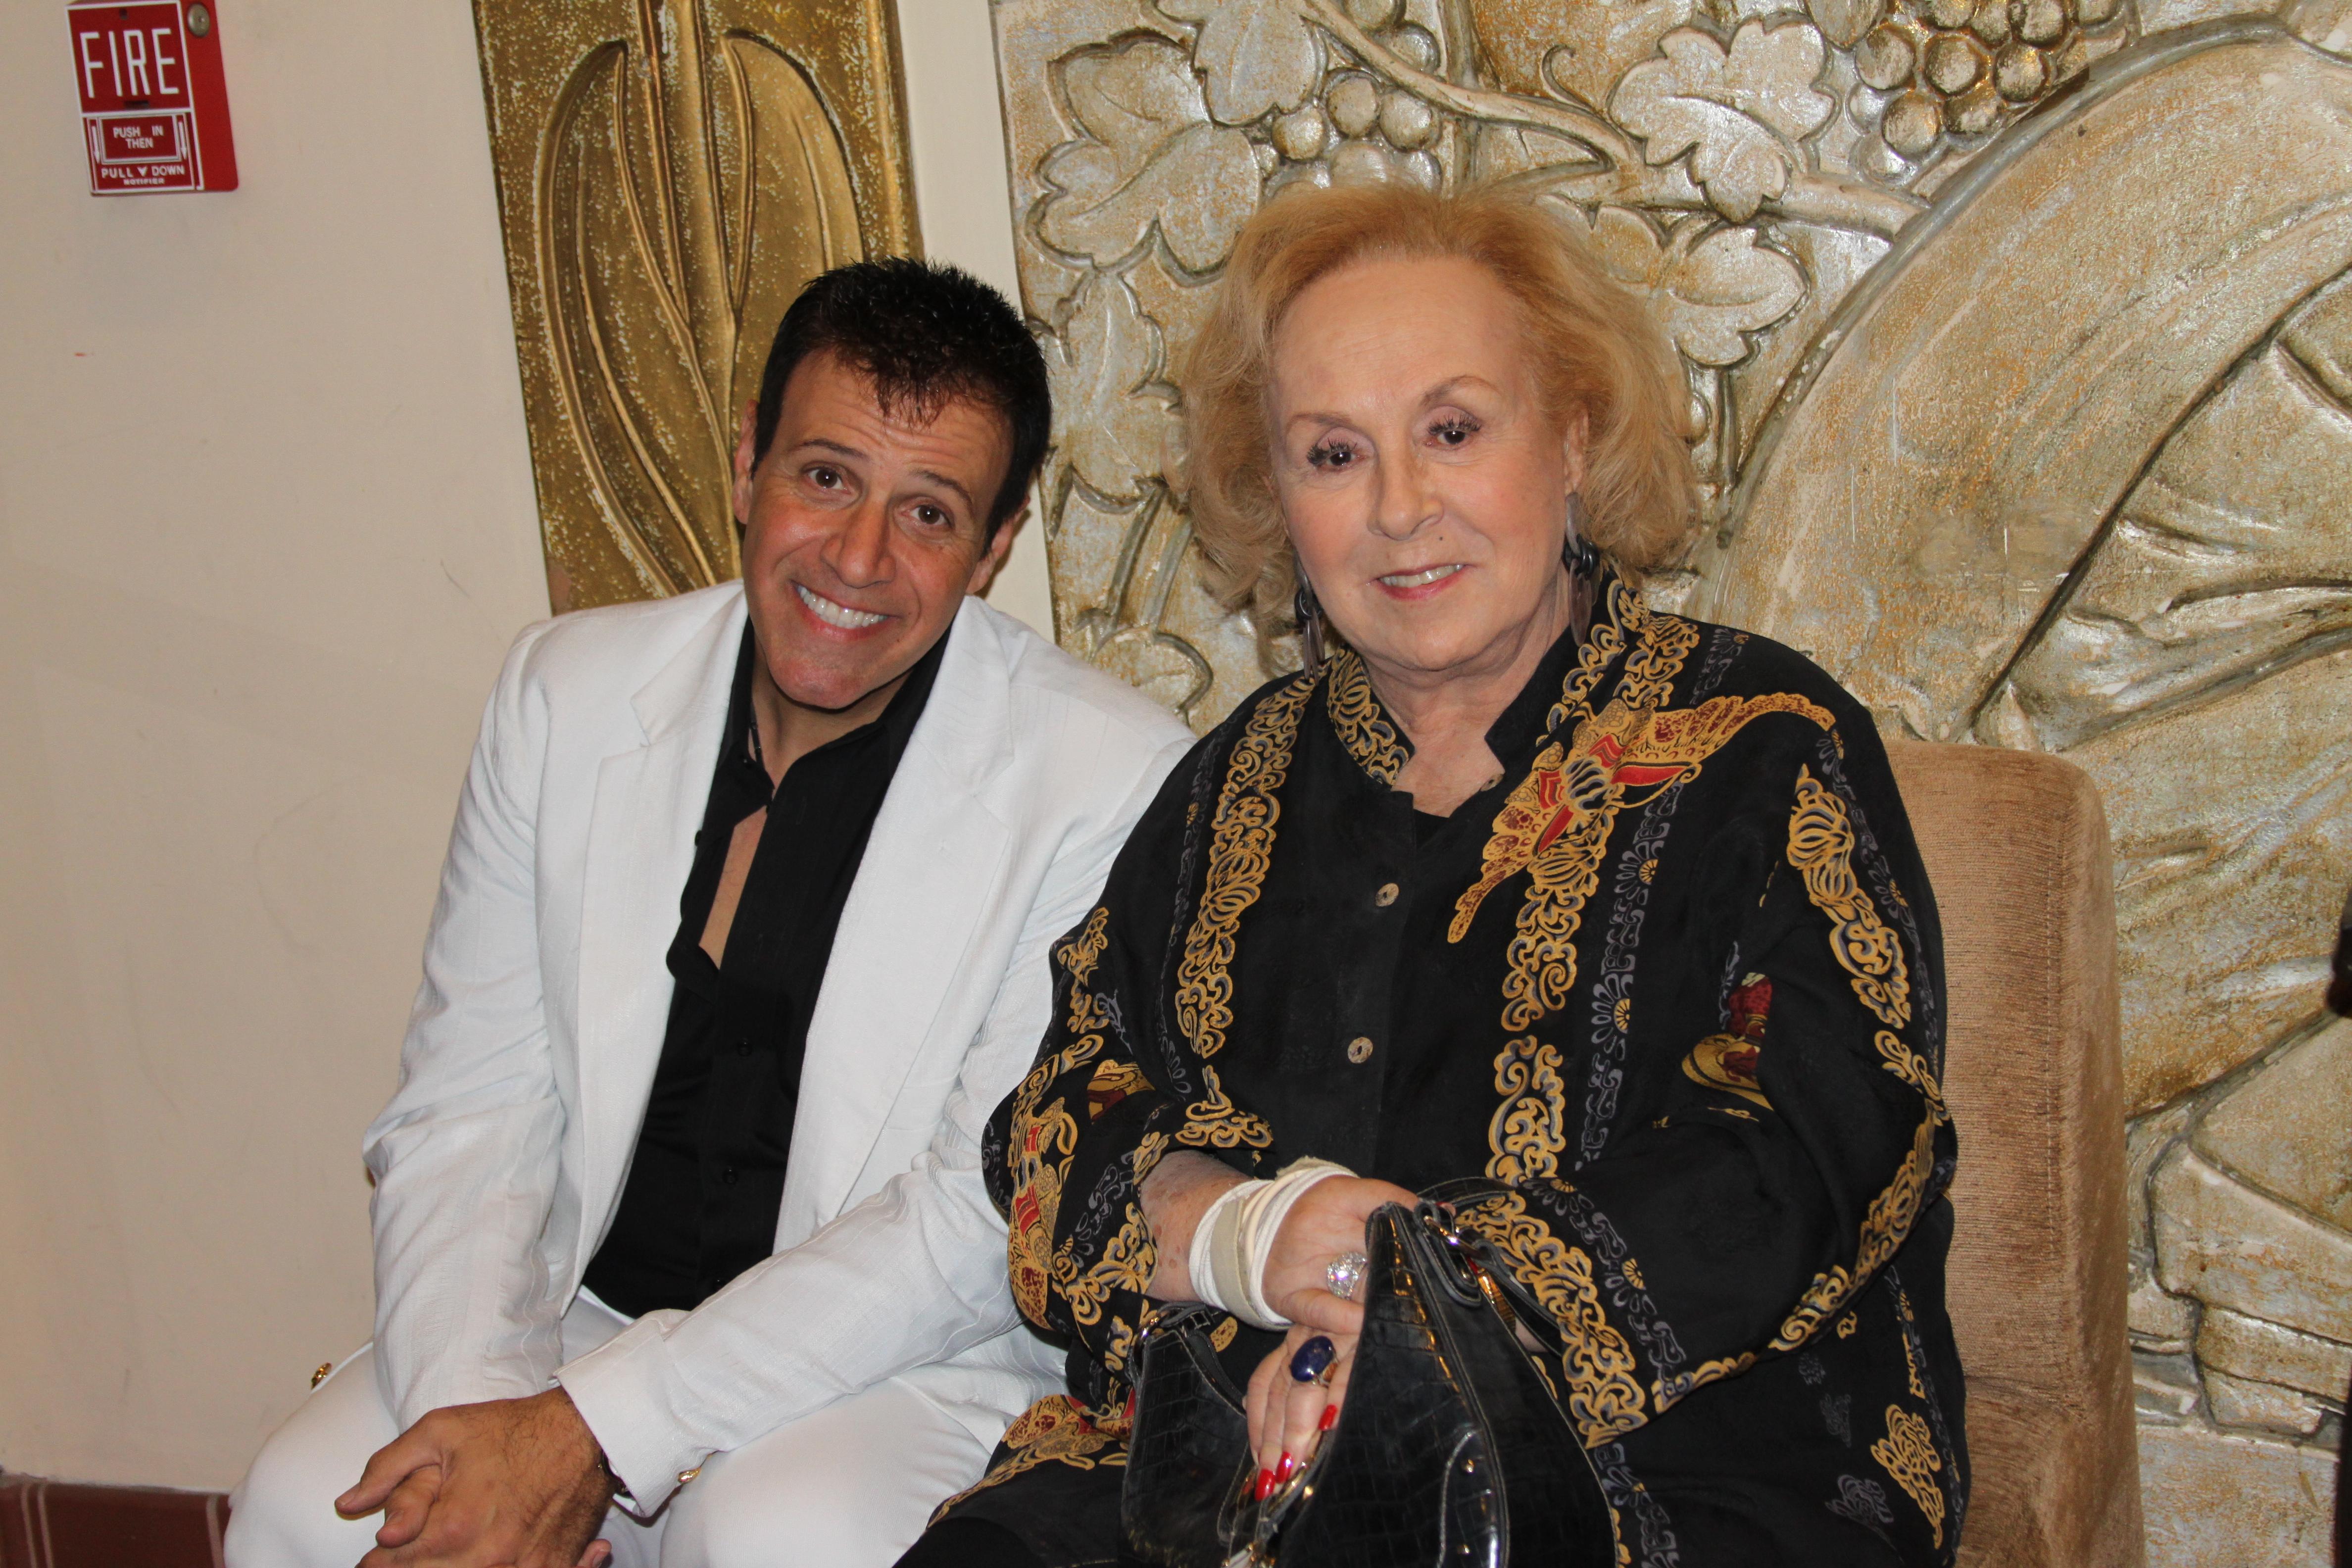 Stephen Sorrentino and Doris Roberts